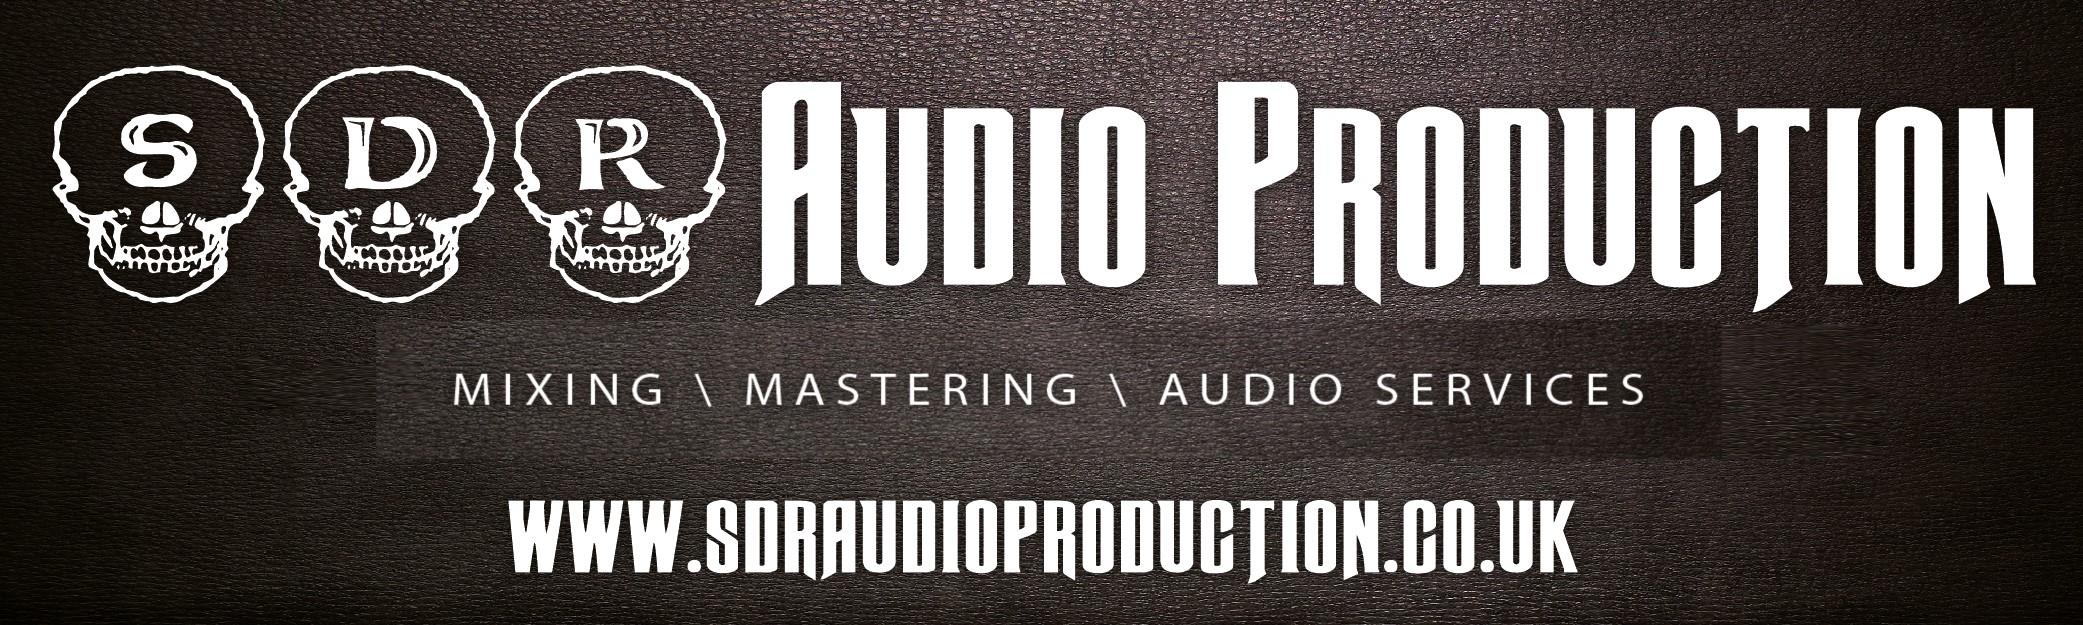 SDR Audio Production